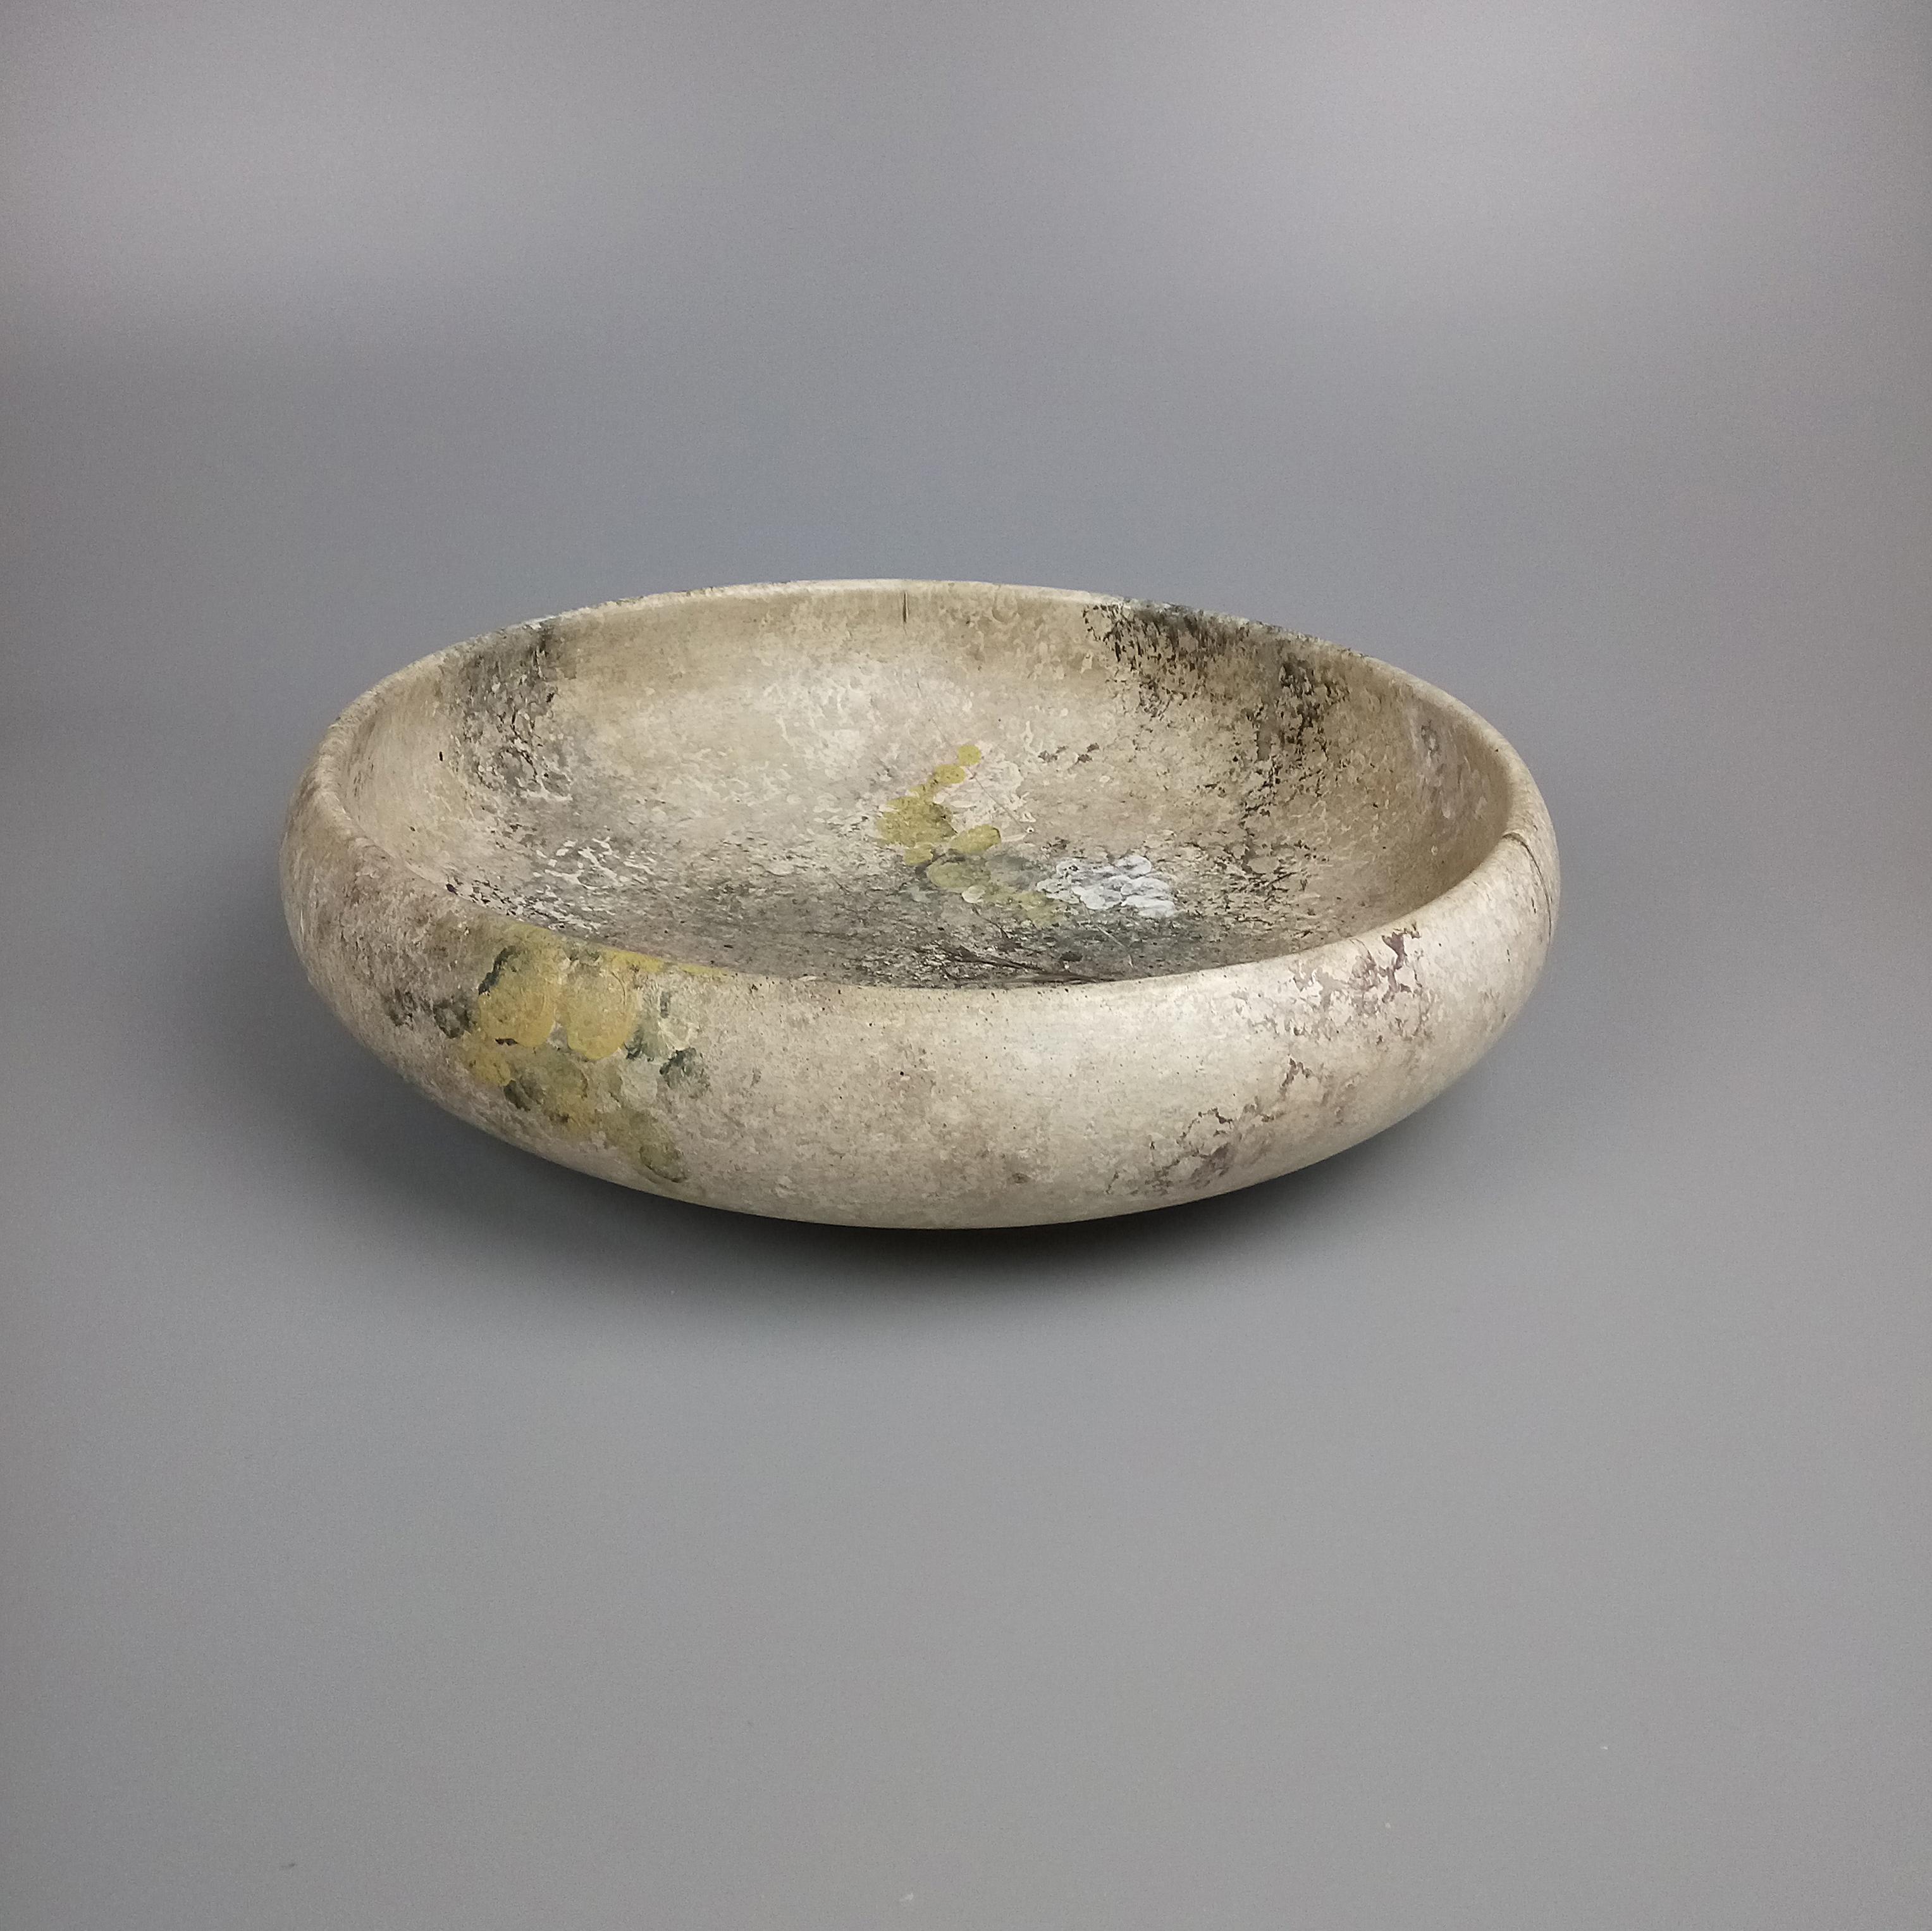 Shallow Stone Effect Bowl